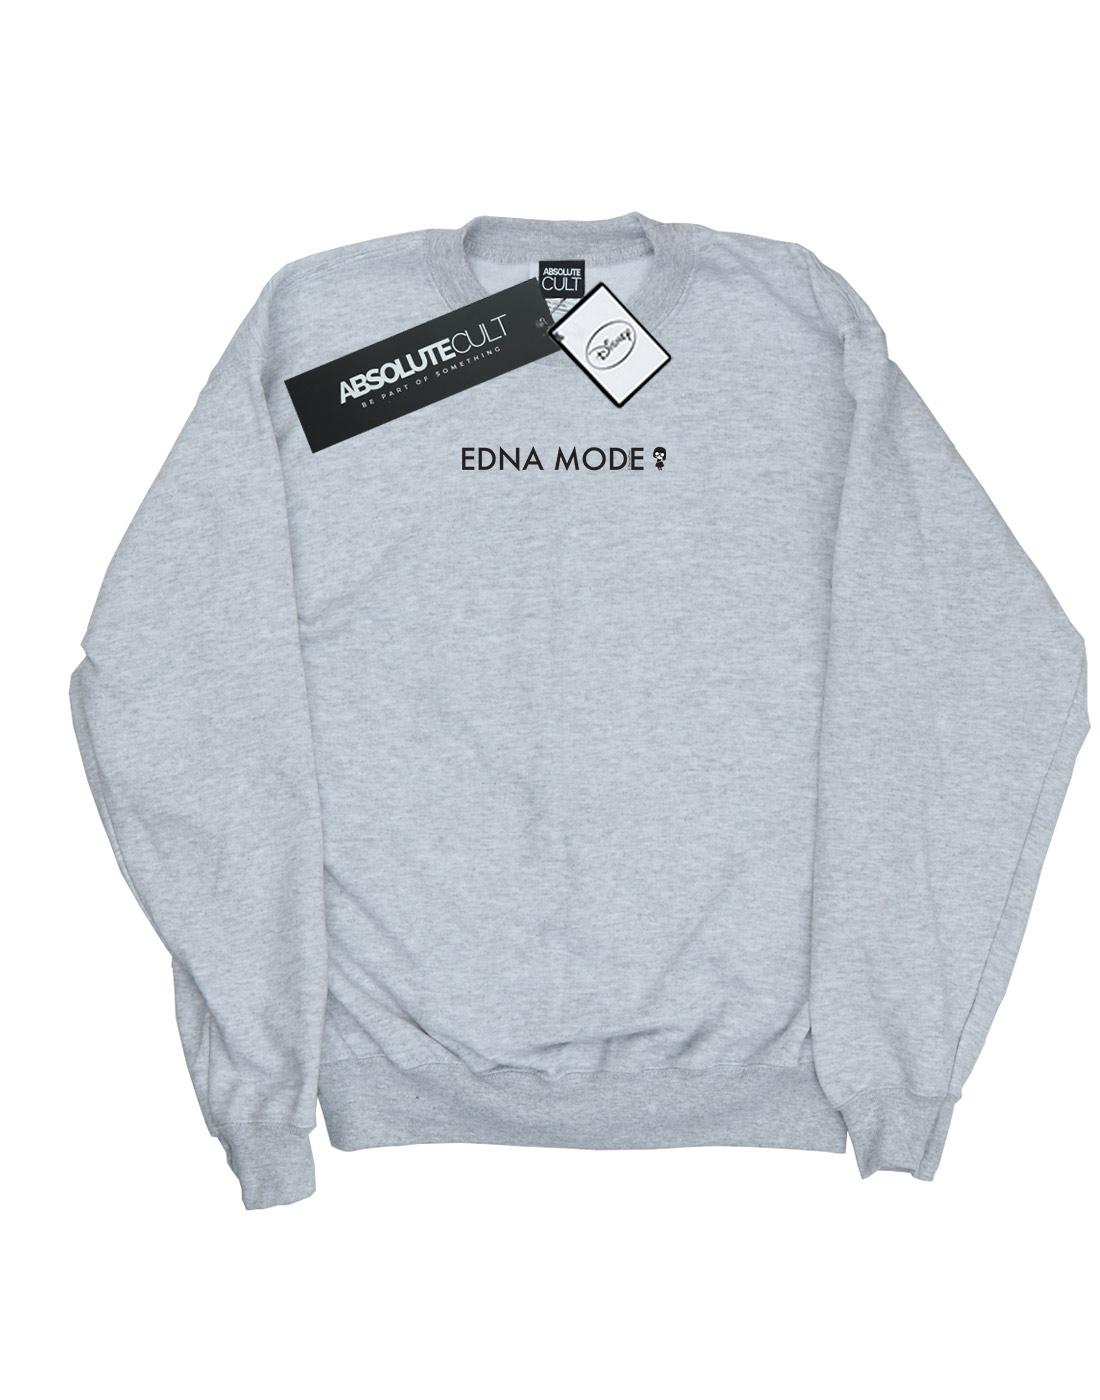 64460e5000b272 Disney-Damen-The-Incredibles-2-Edna-Mode-Sweatshirt Indexbild